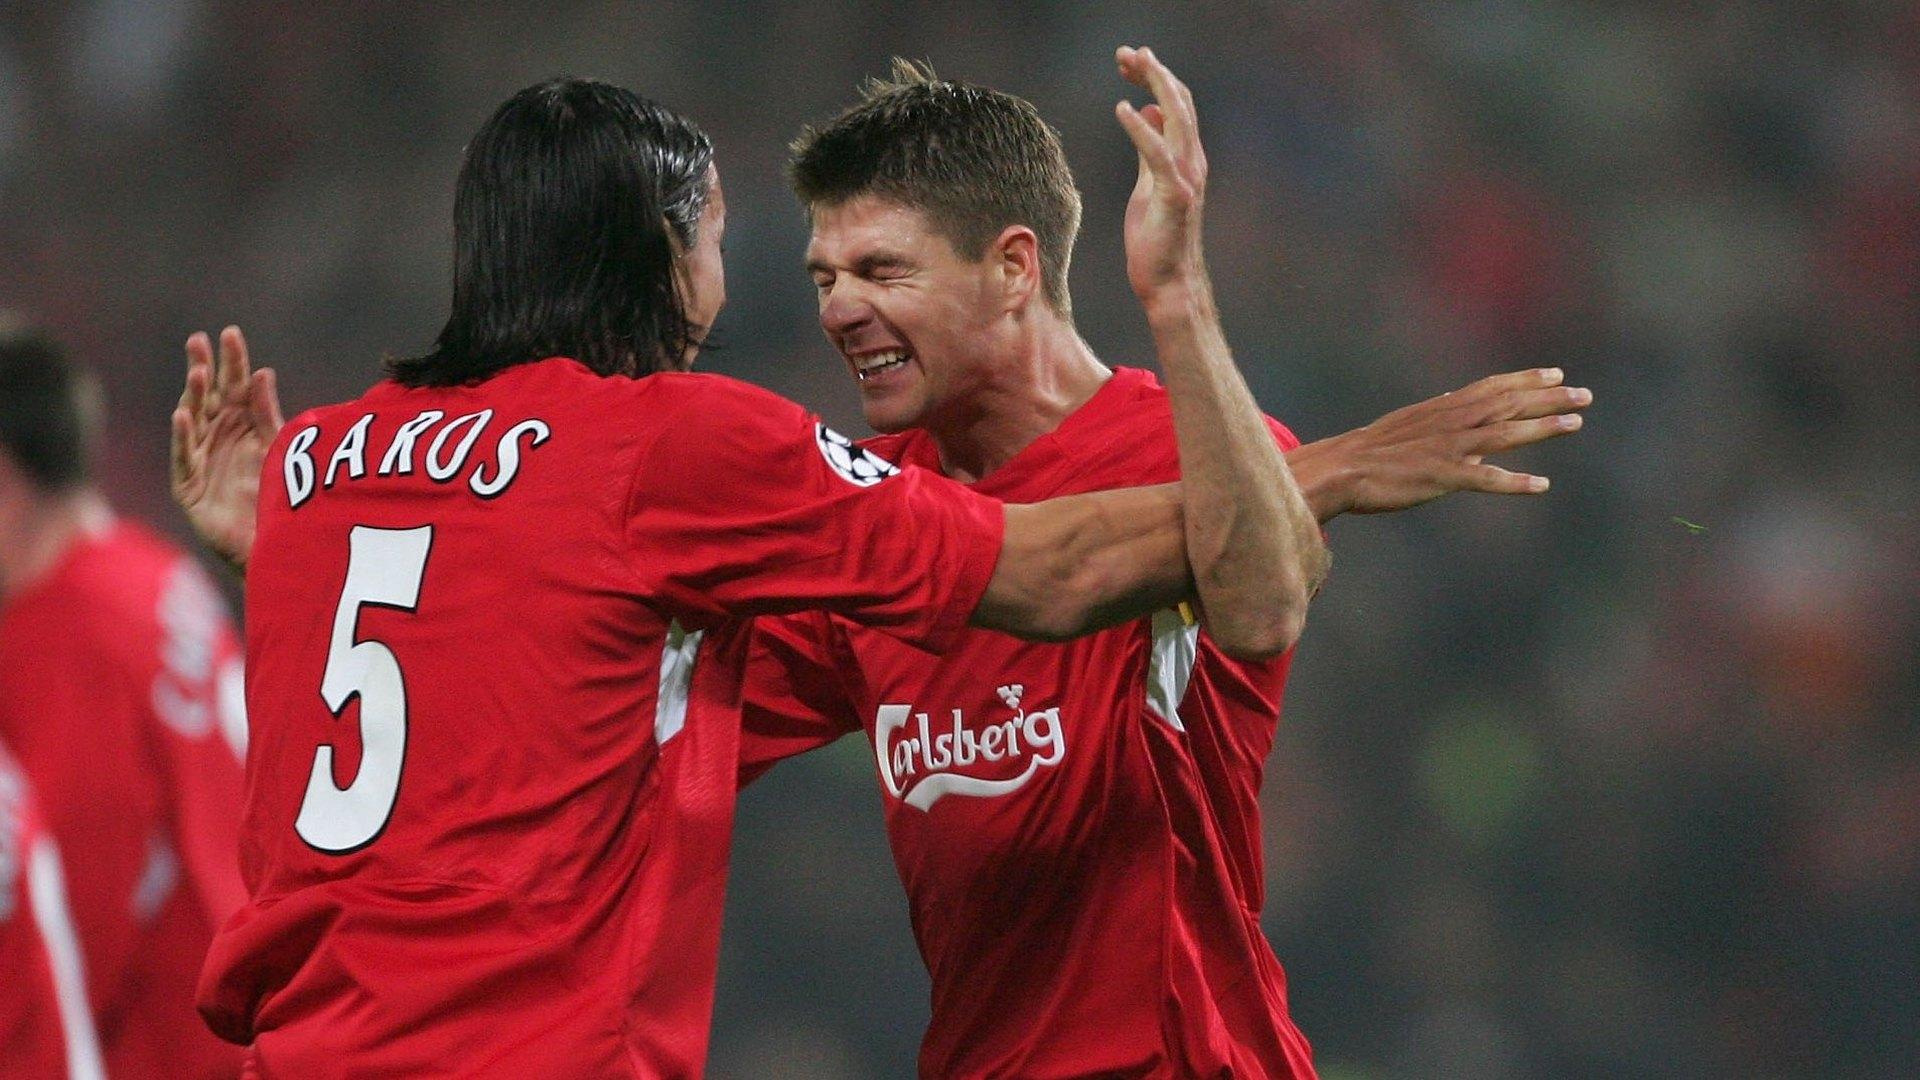 Konate inherits Wijnaldum's No 5 shirt at Liverpool as £36m defender joins Klopp's squad